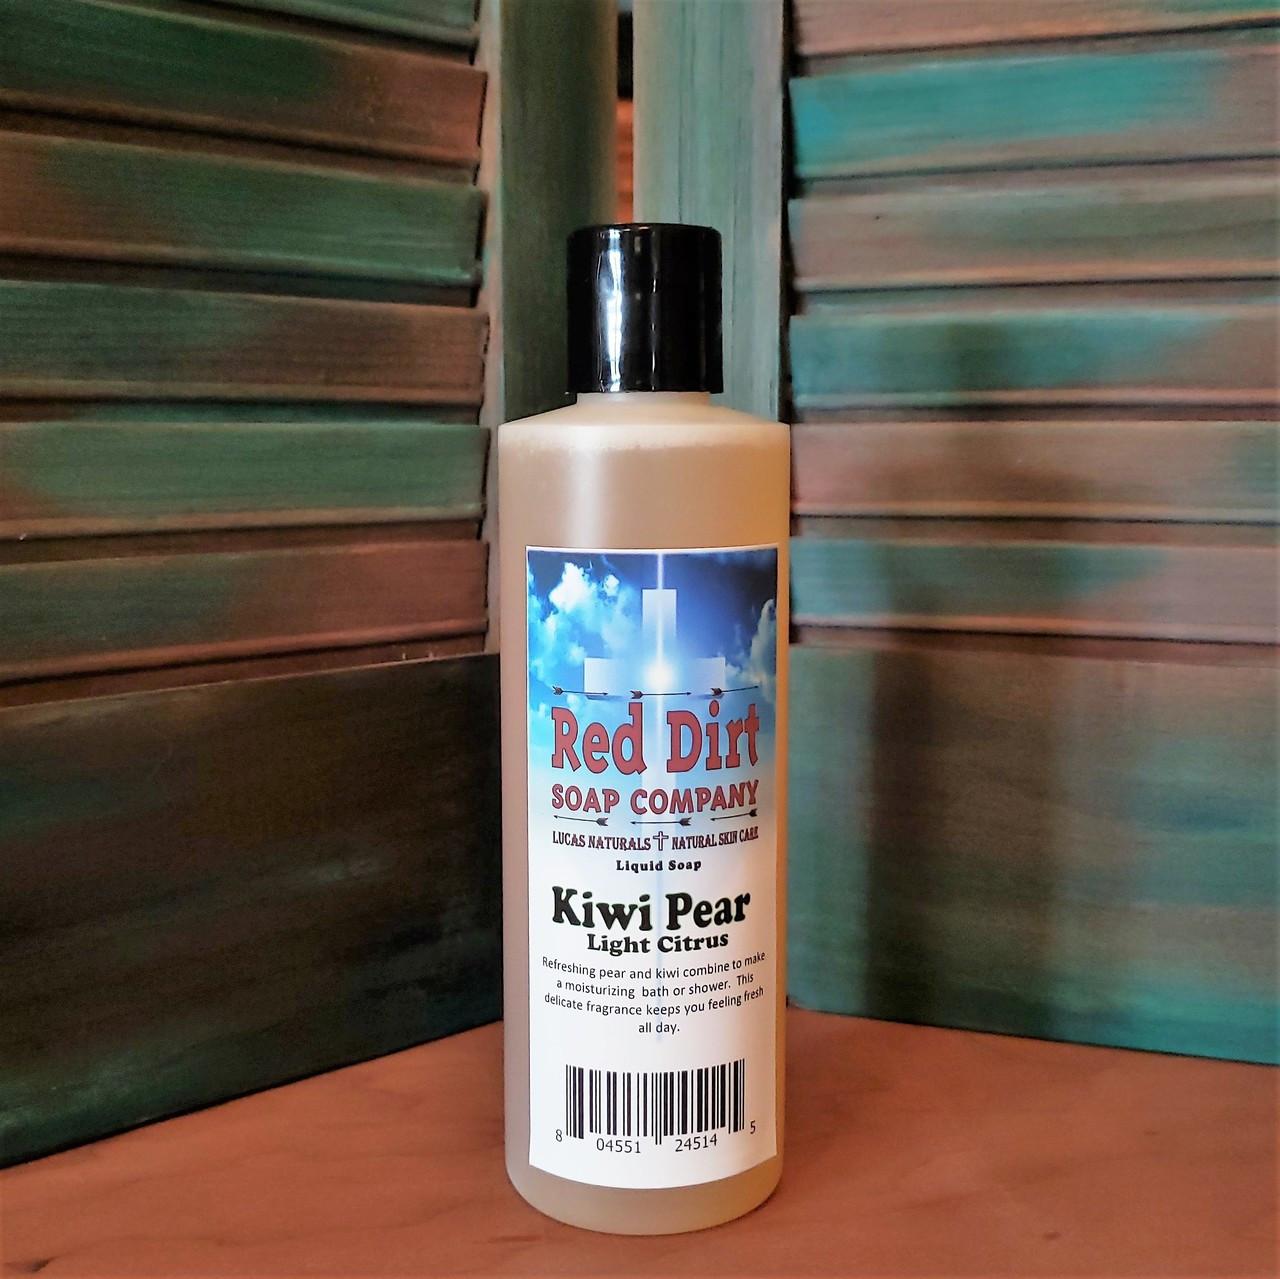 Kiwi Pear Natural Body Wash